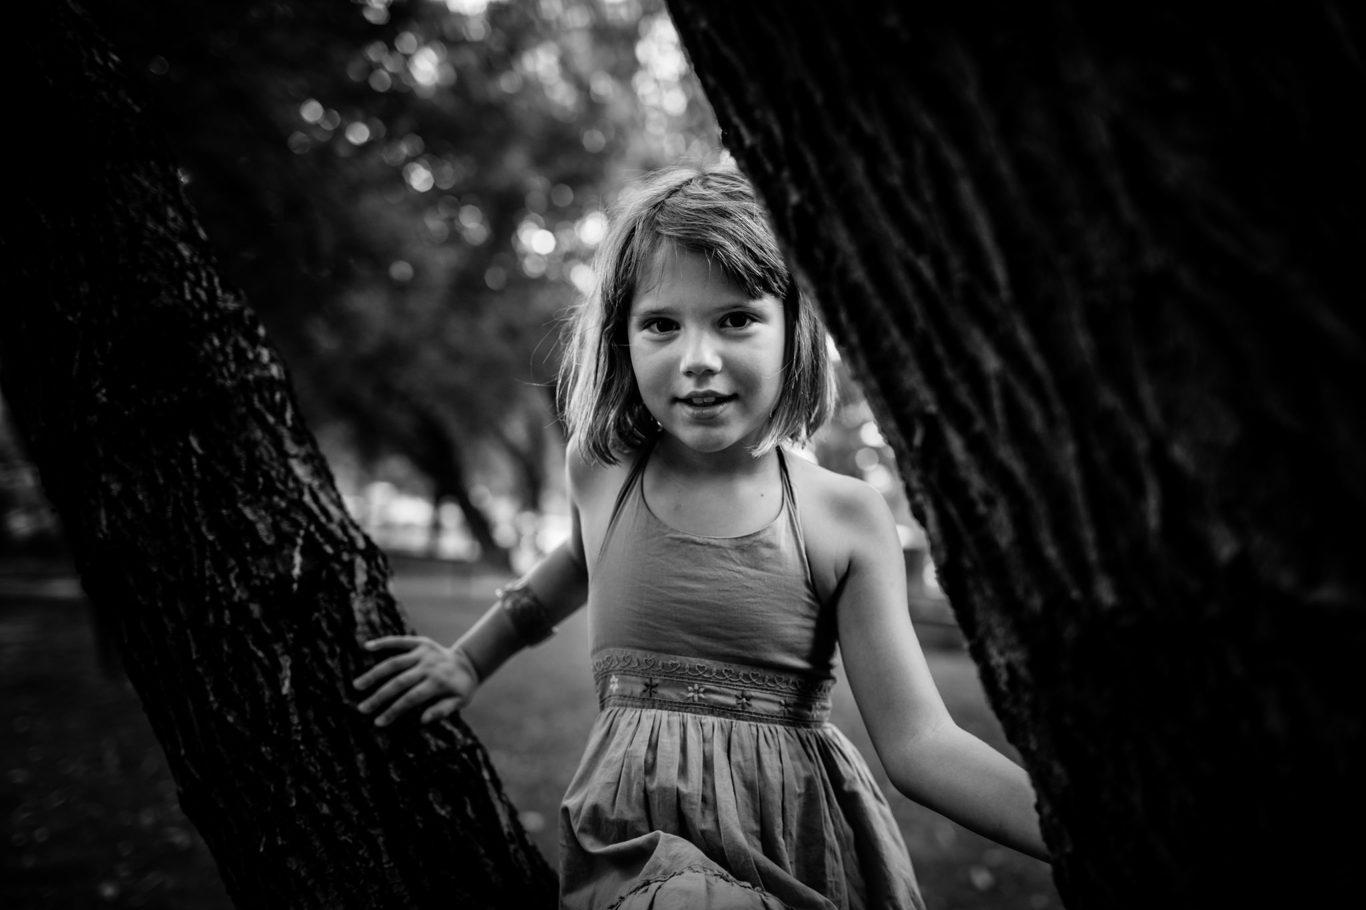 0175-fotografii-familie-ioana-alex-maia-roxi-fotograf-ciprian-dumitrescu-cd2_2223